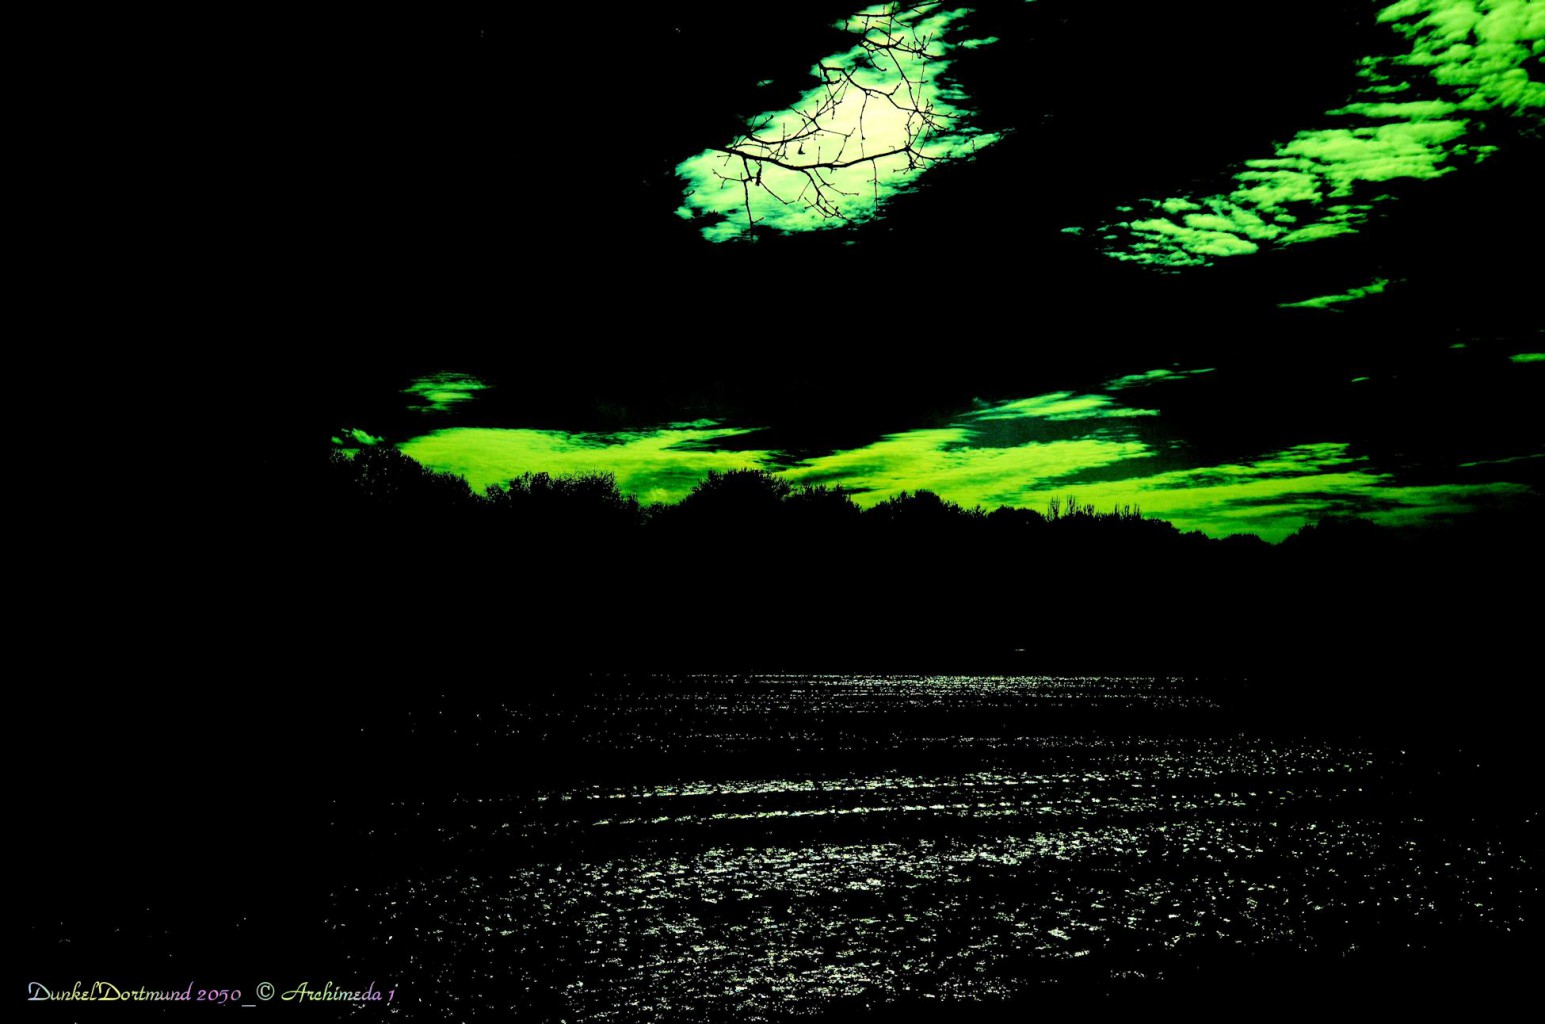 DunkelDortmund 2050_© Archimeda 1